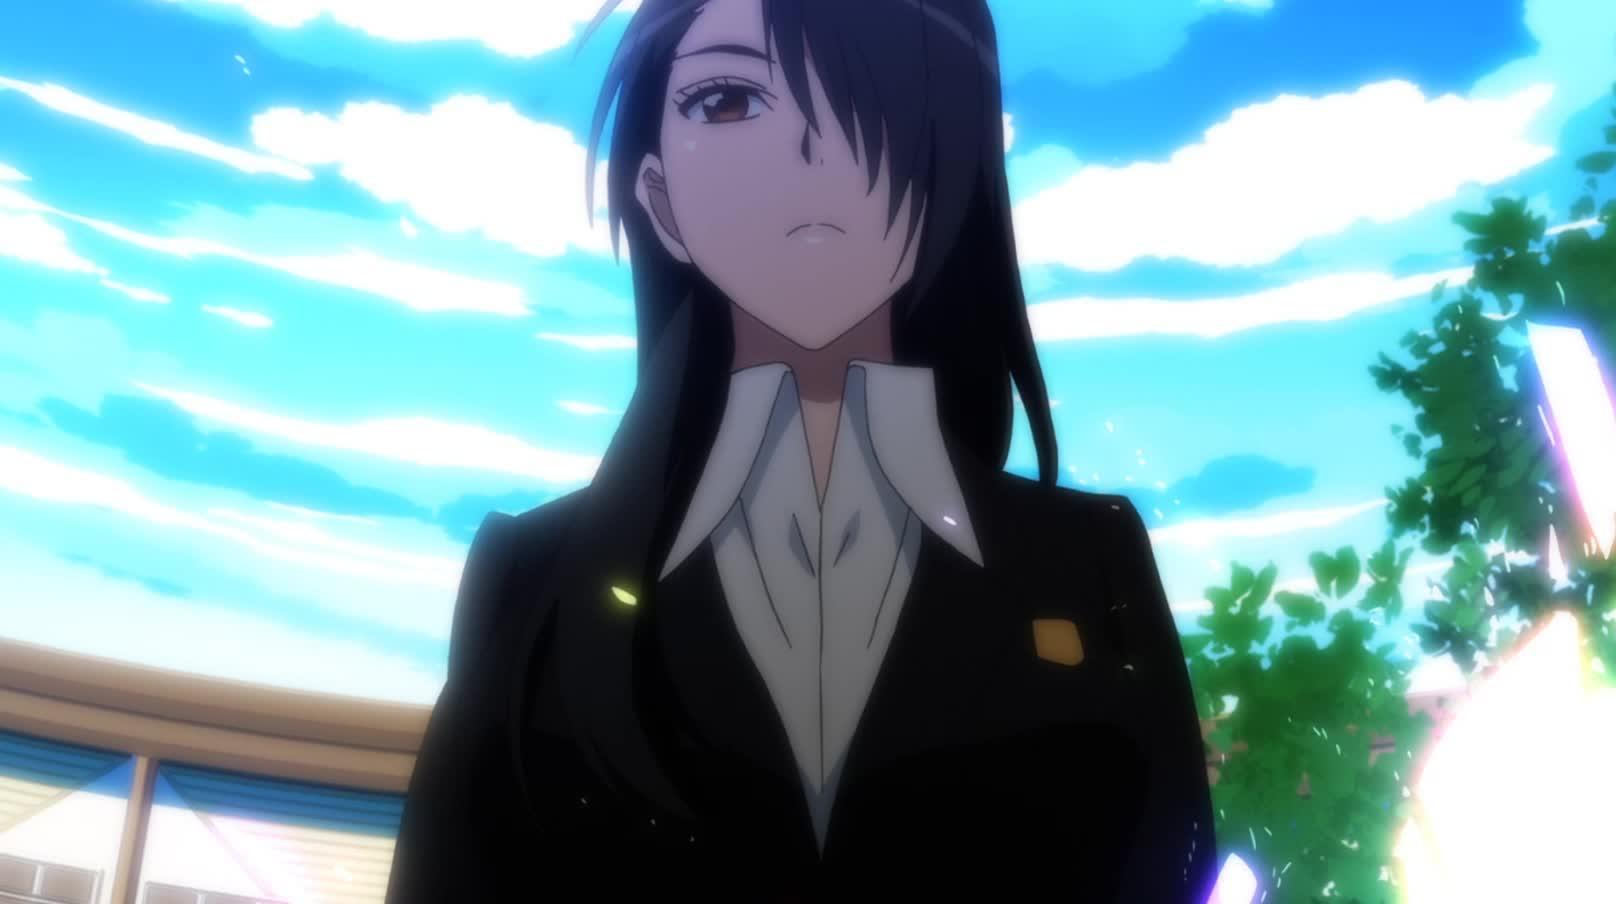 Nisekoi S02E09 (8) GIFs